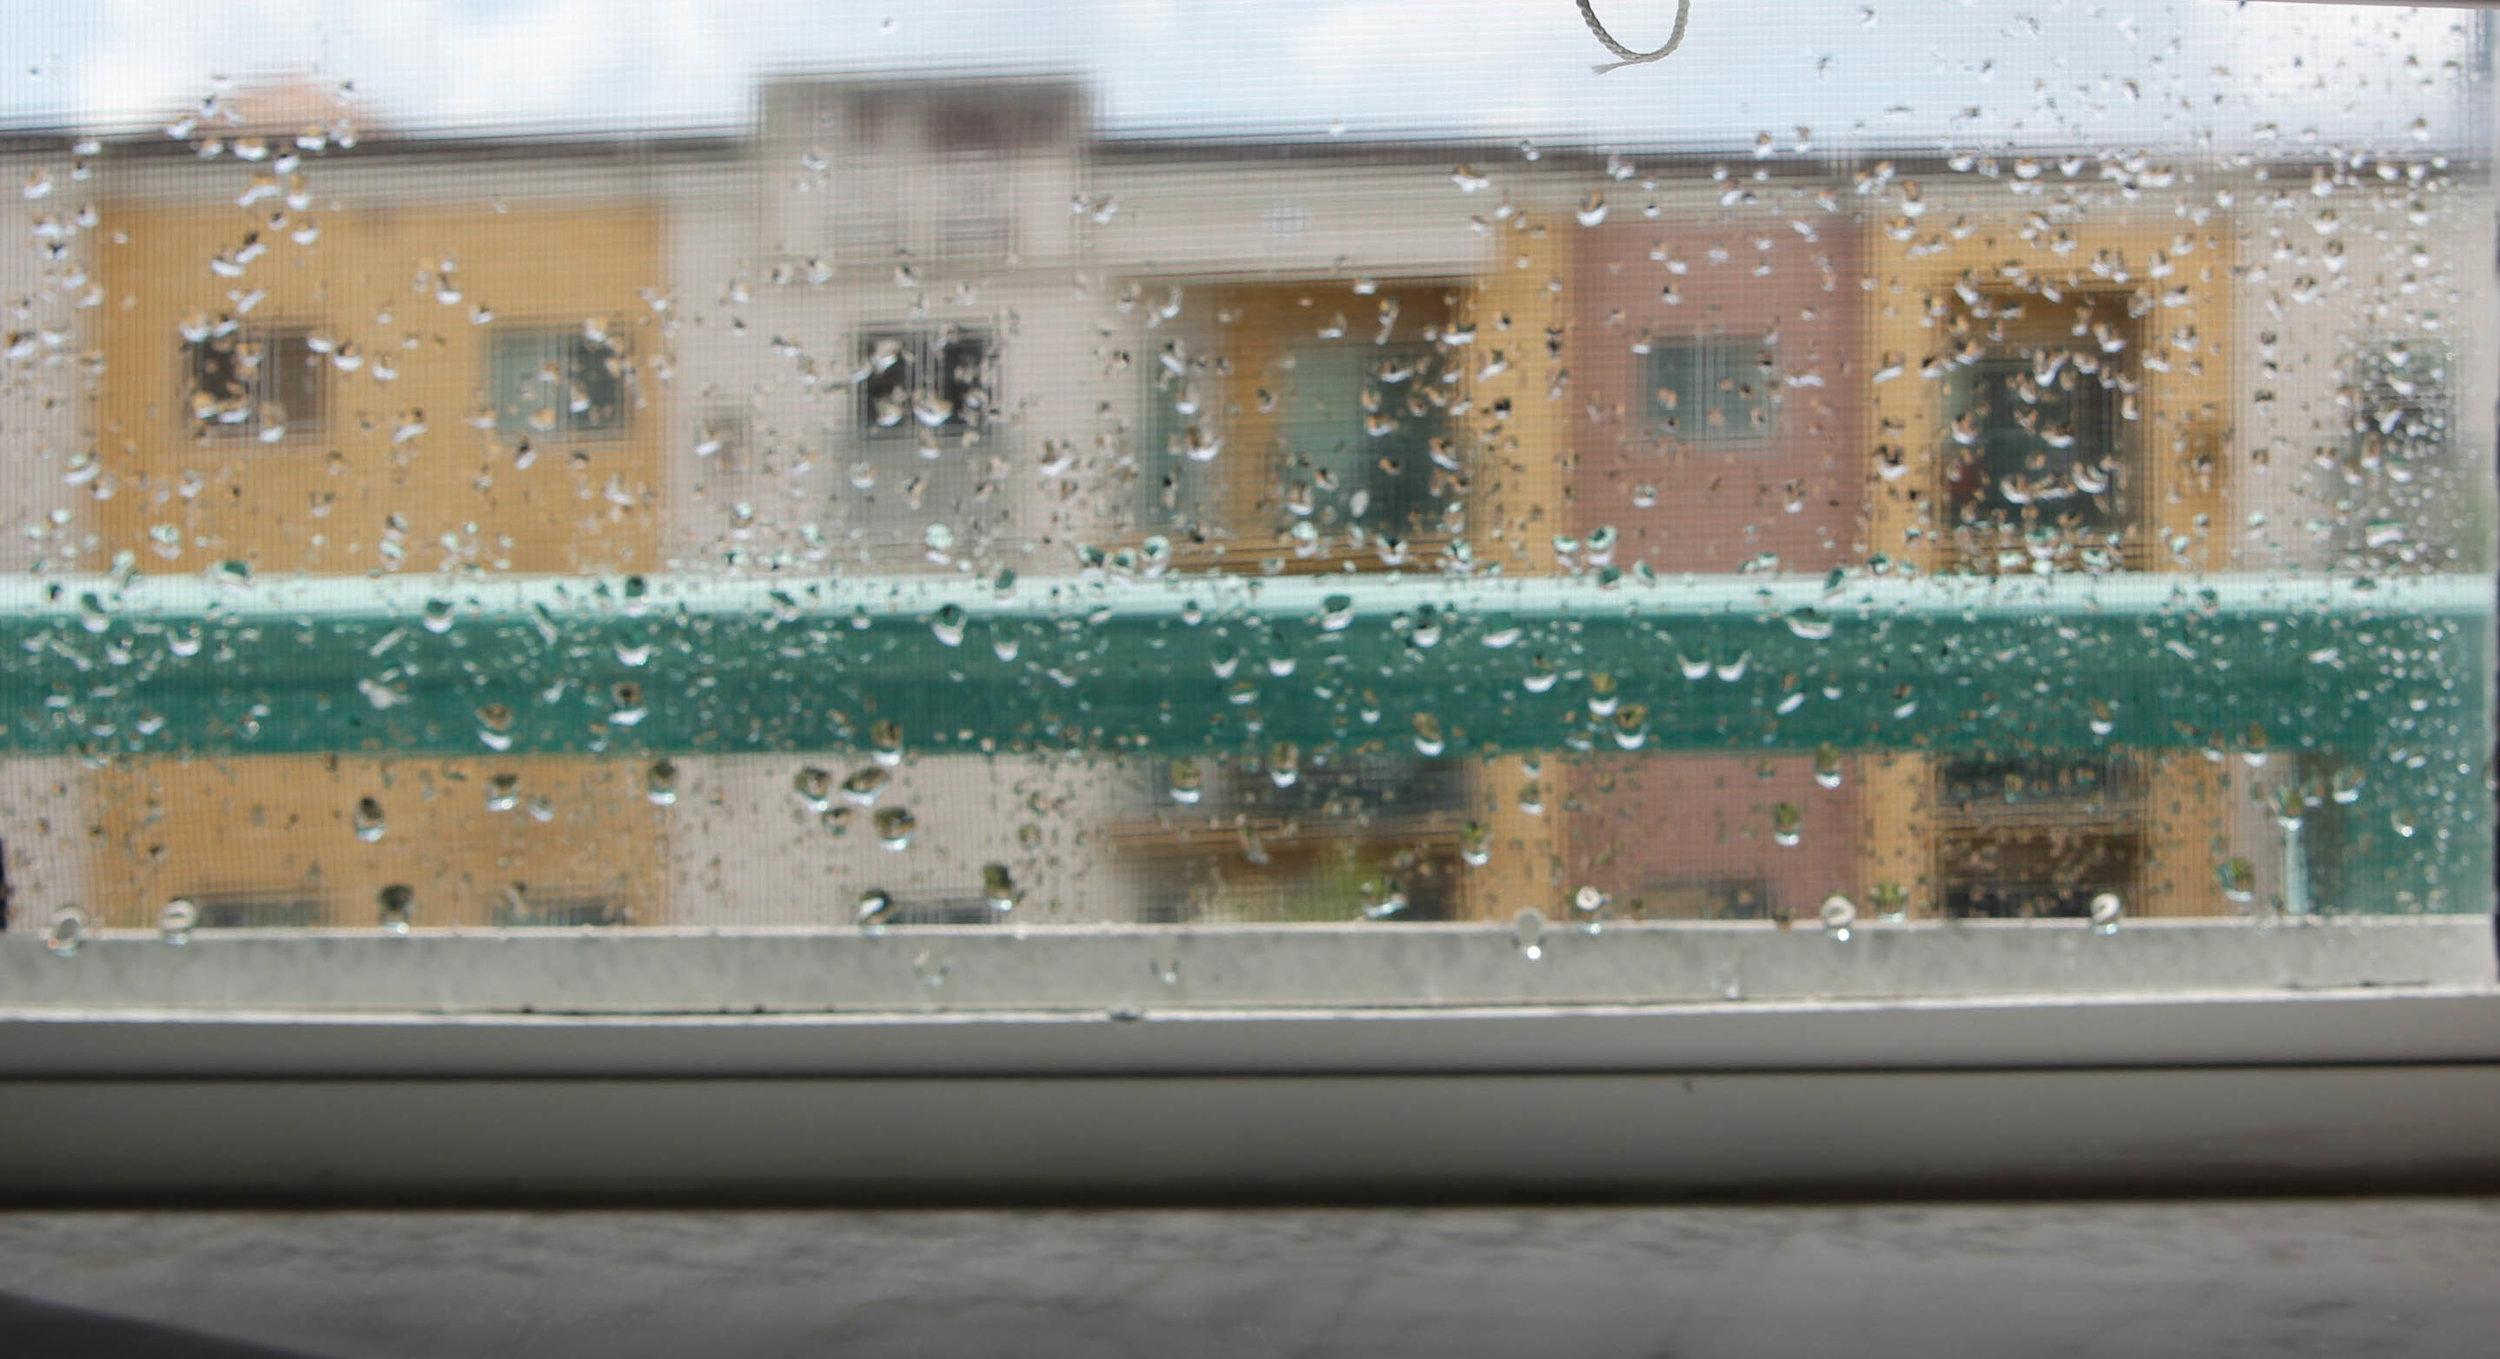 rain-in-foreground.jpg